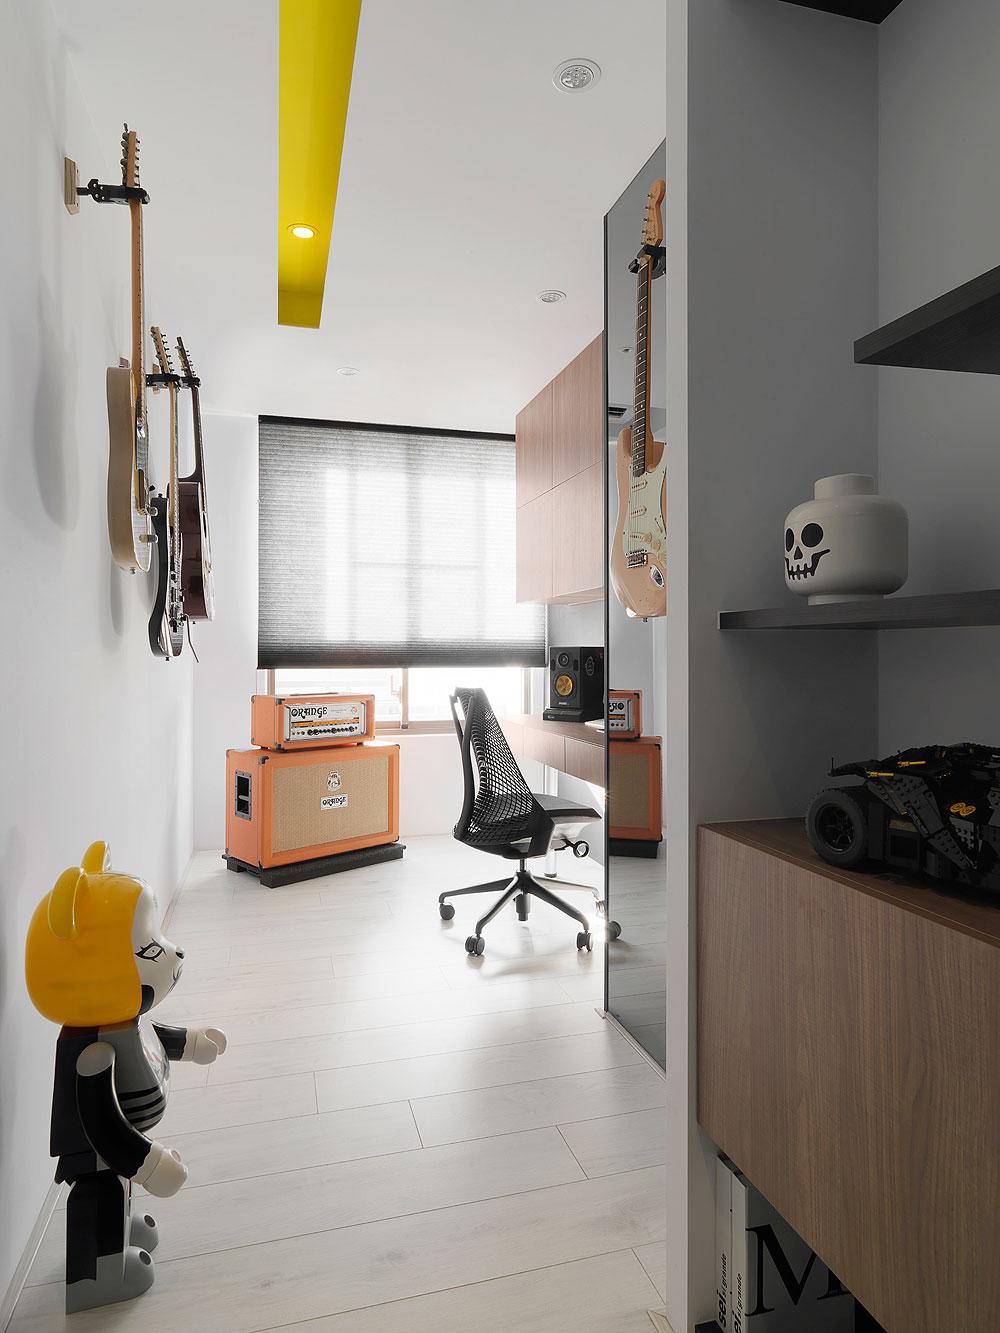 h-residence-z-axis-design (13)